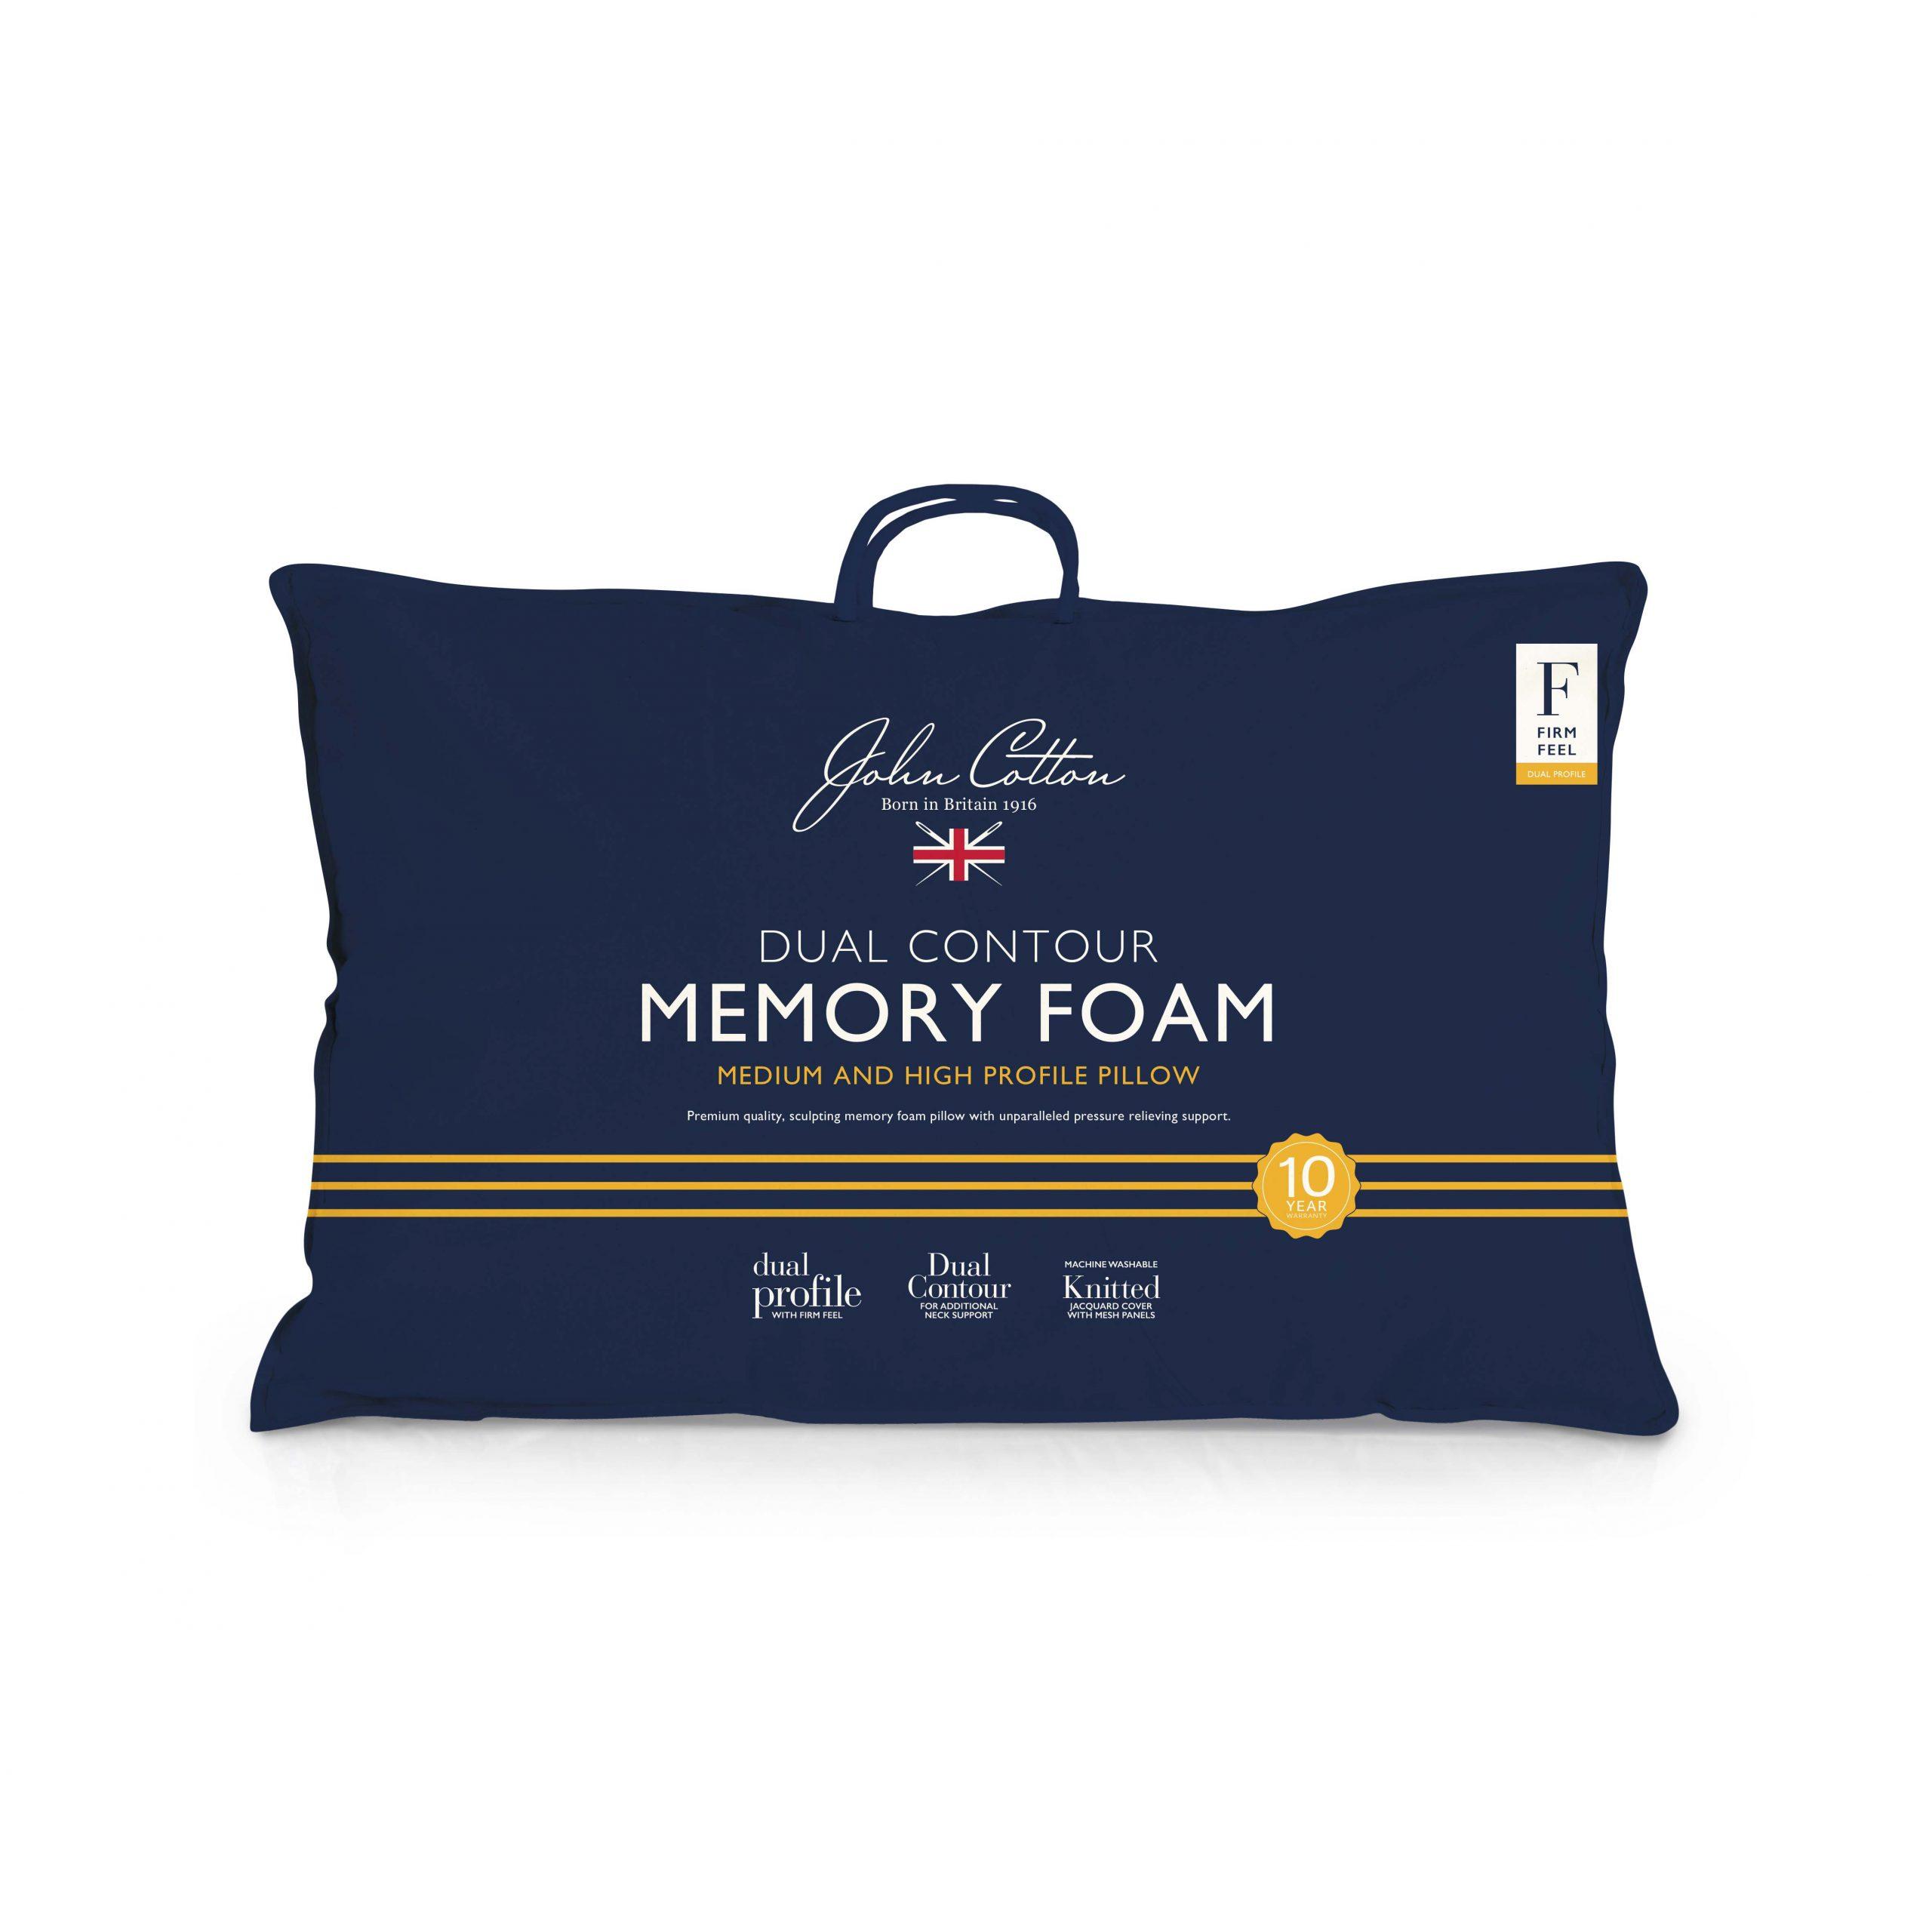 John Cotton Dual Contour Memory Foam Pillow